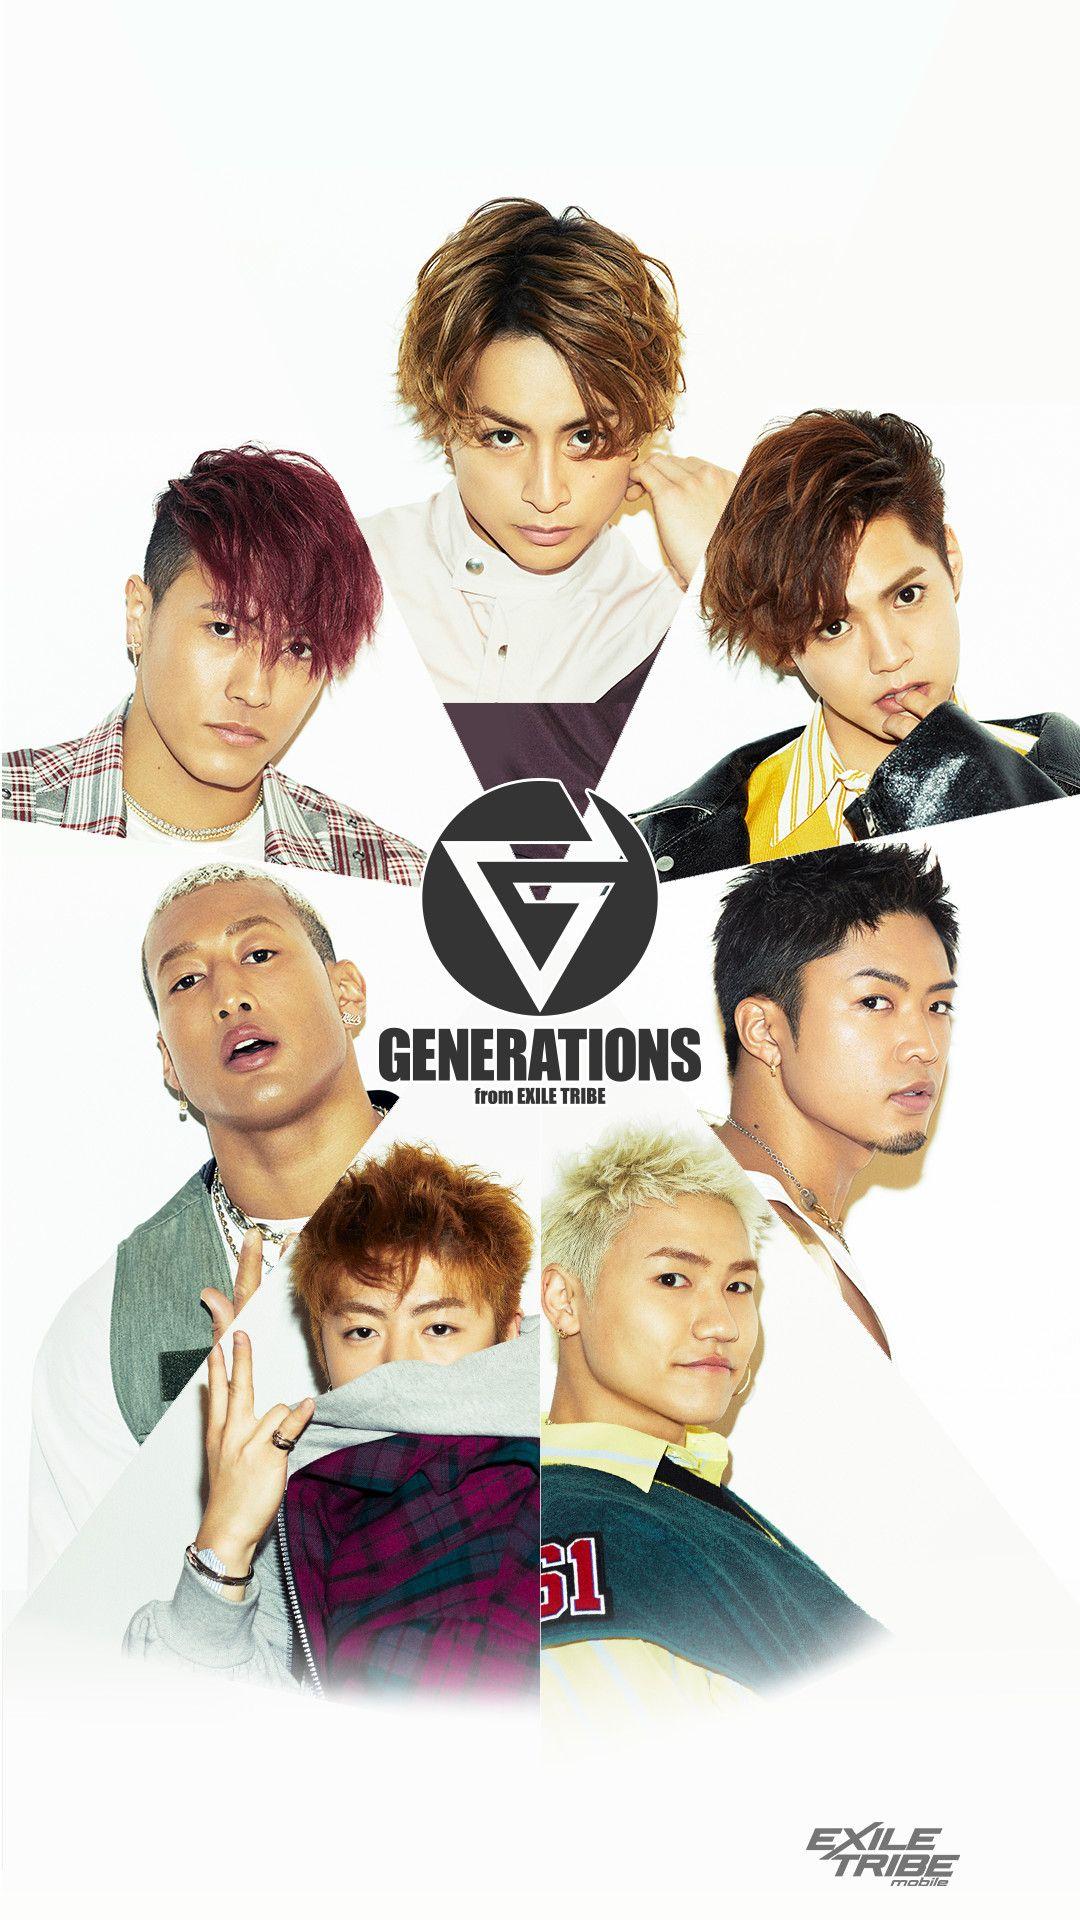 Generations ジェネ Generations 画像 ジェネレーション